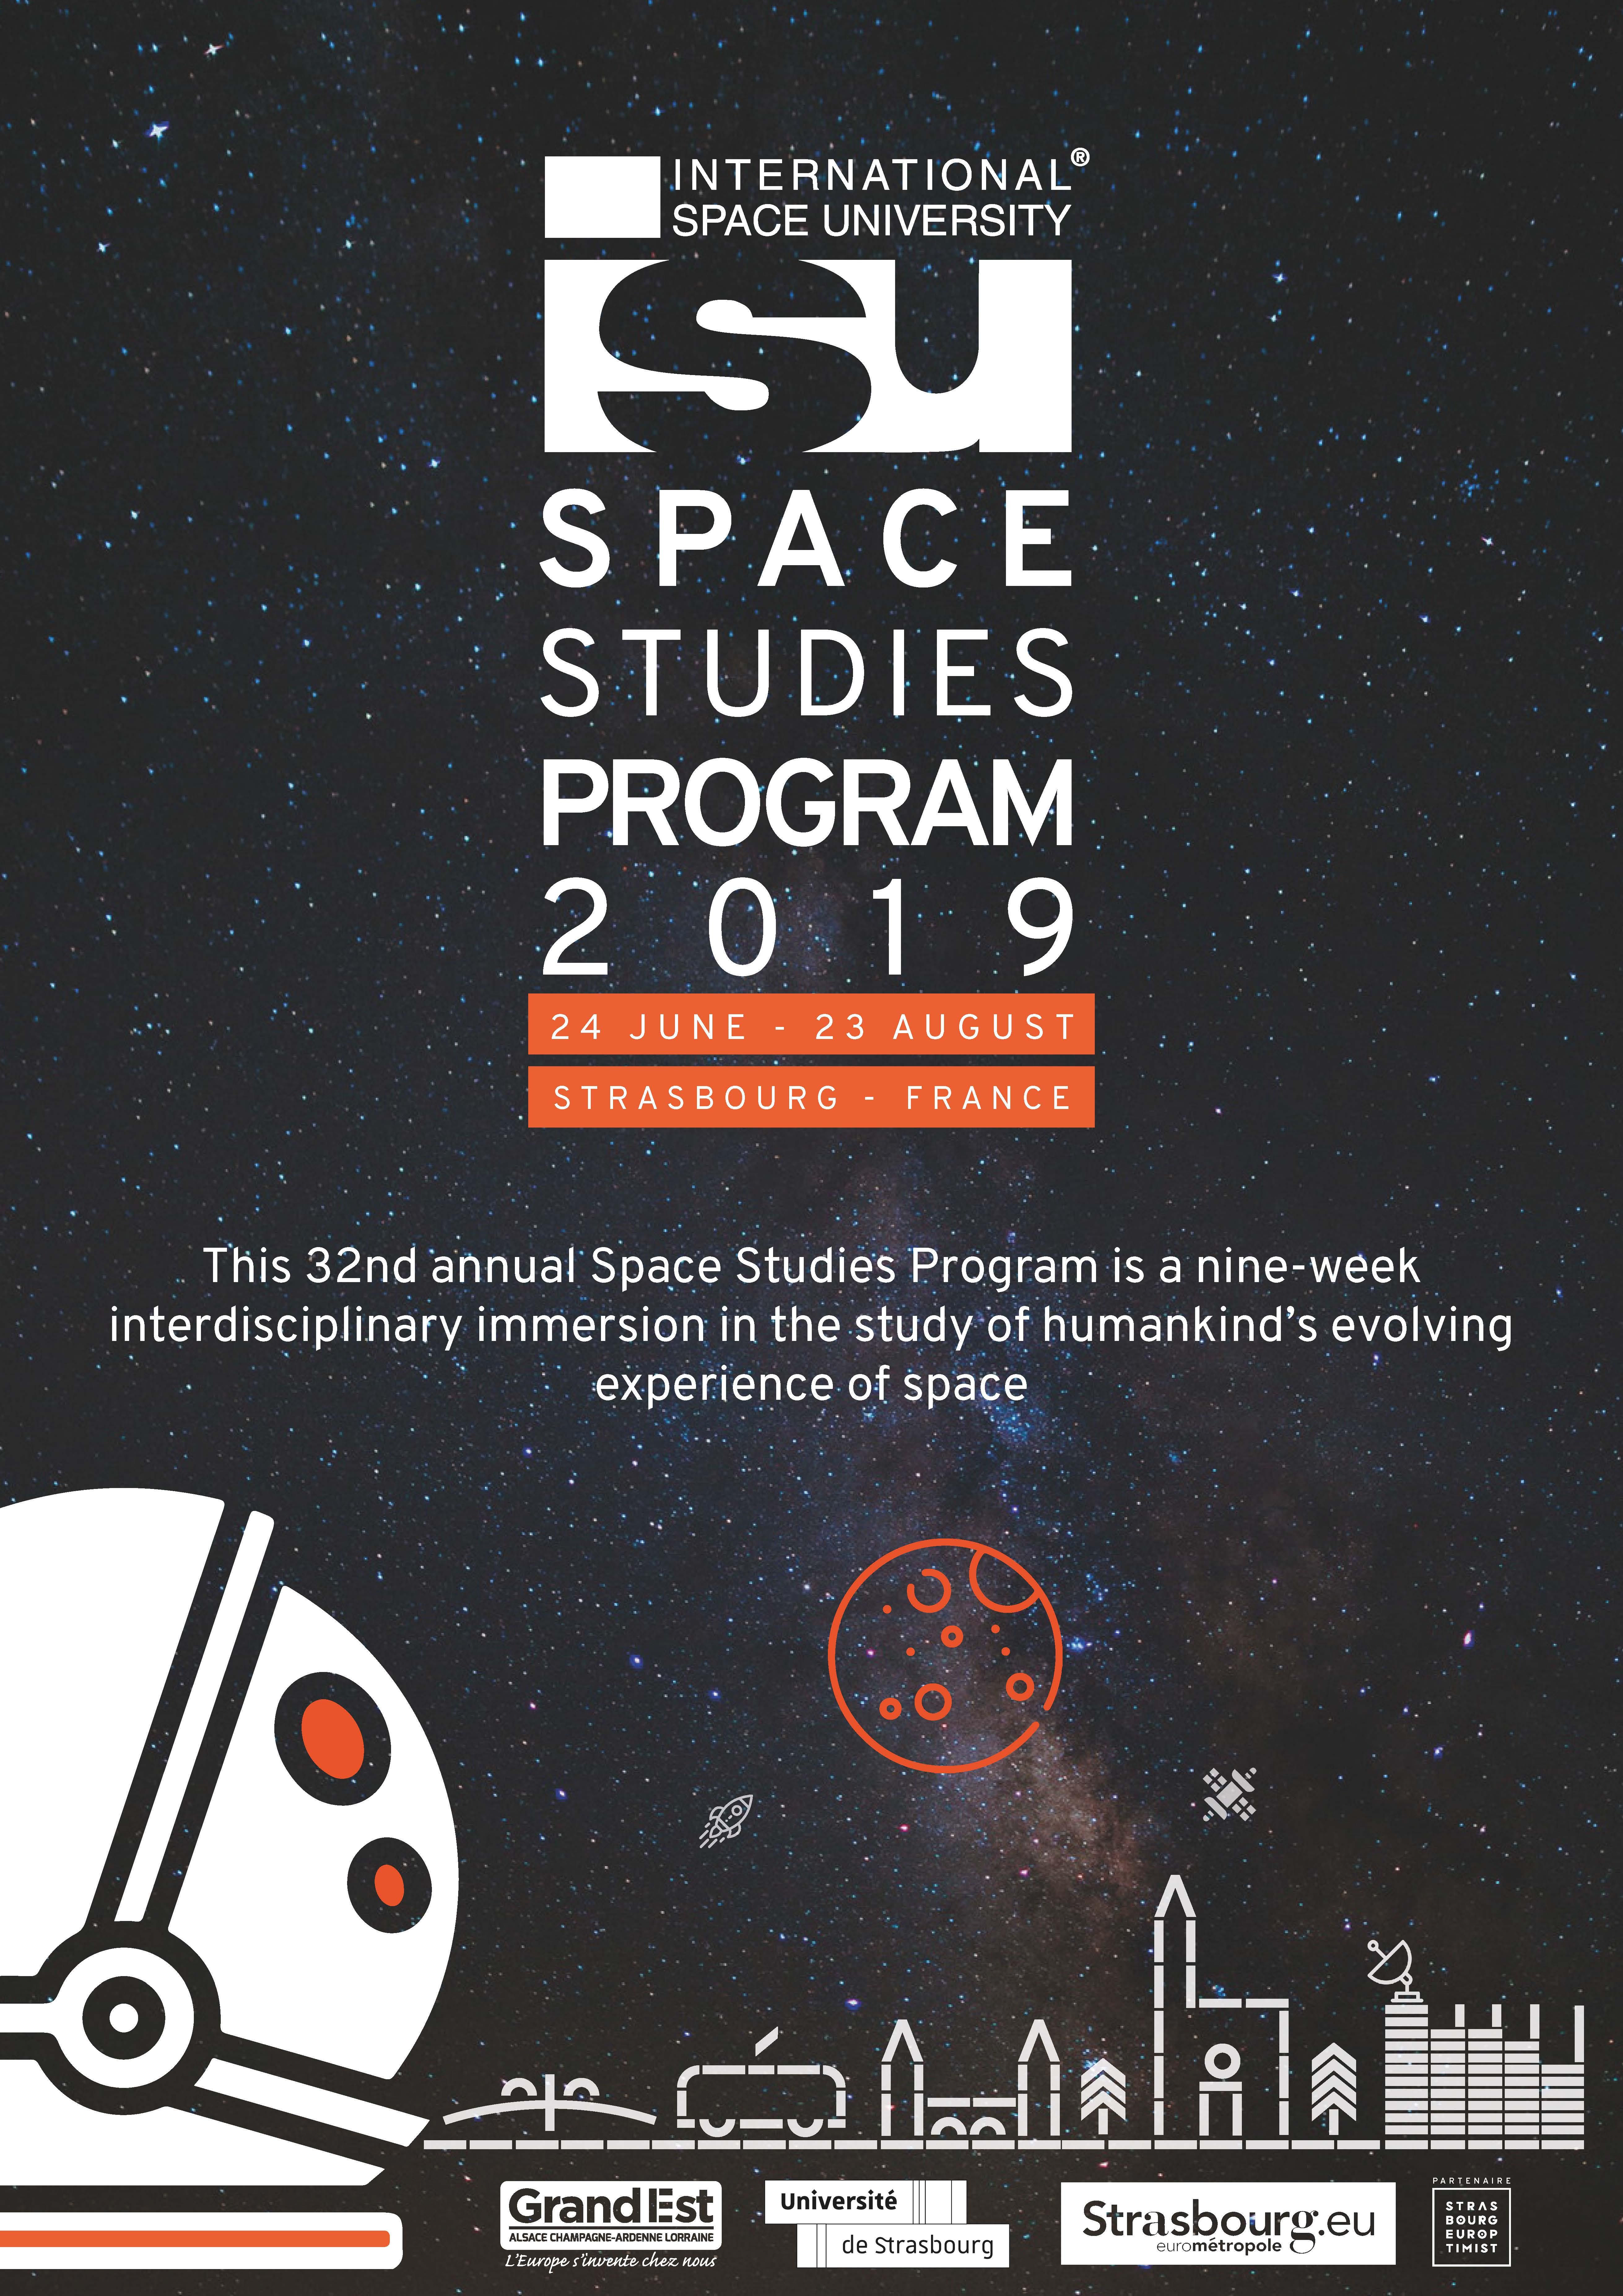 Isu Academic Calendar.Isu Space Studies Program Ssp19